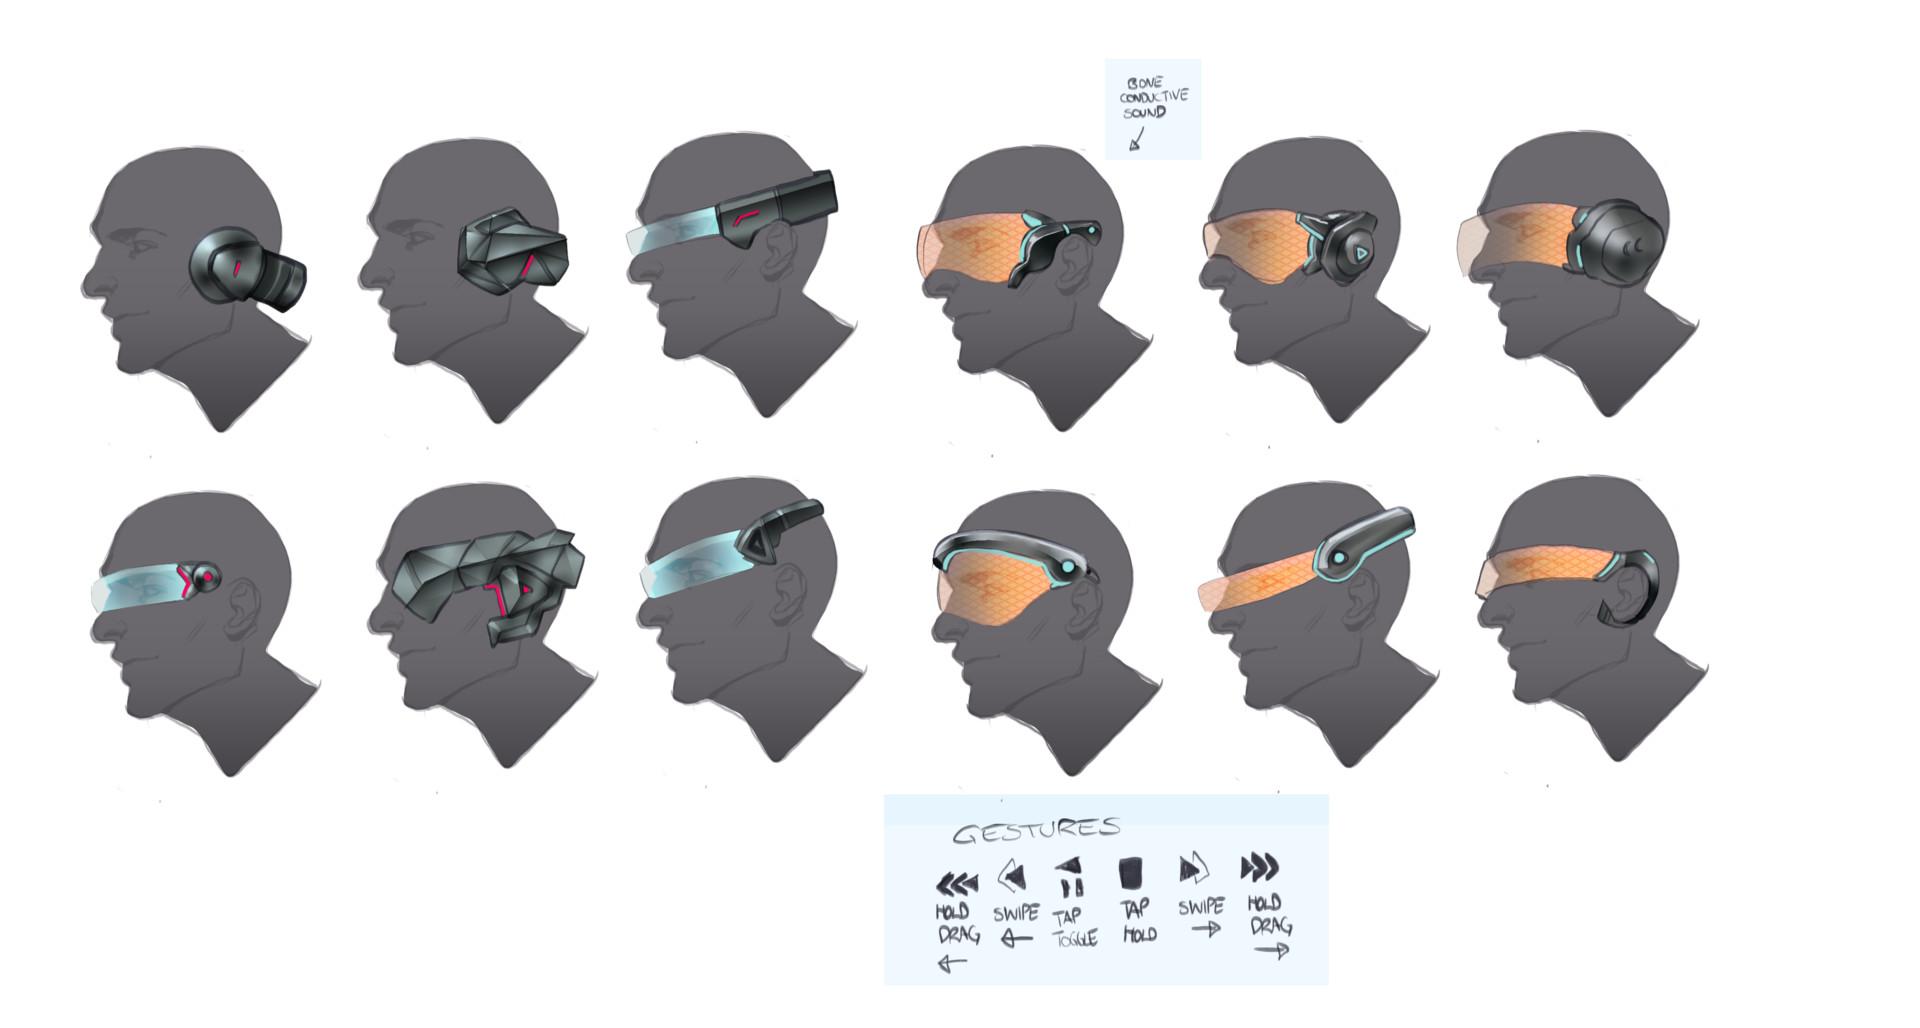 Meta olympia mightydynamo headsets